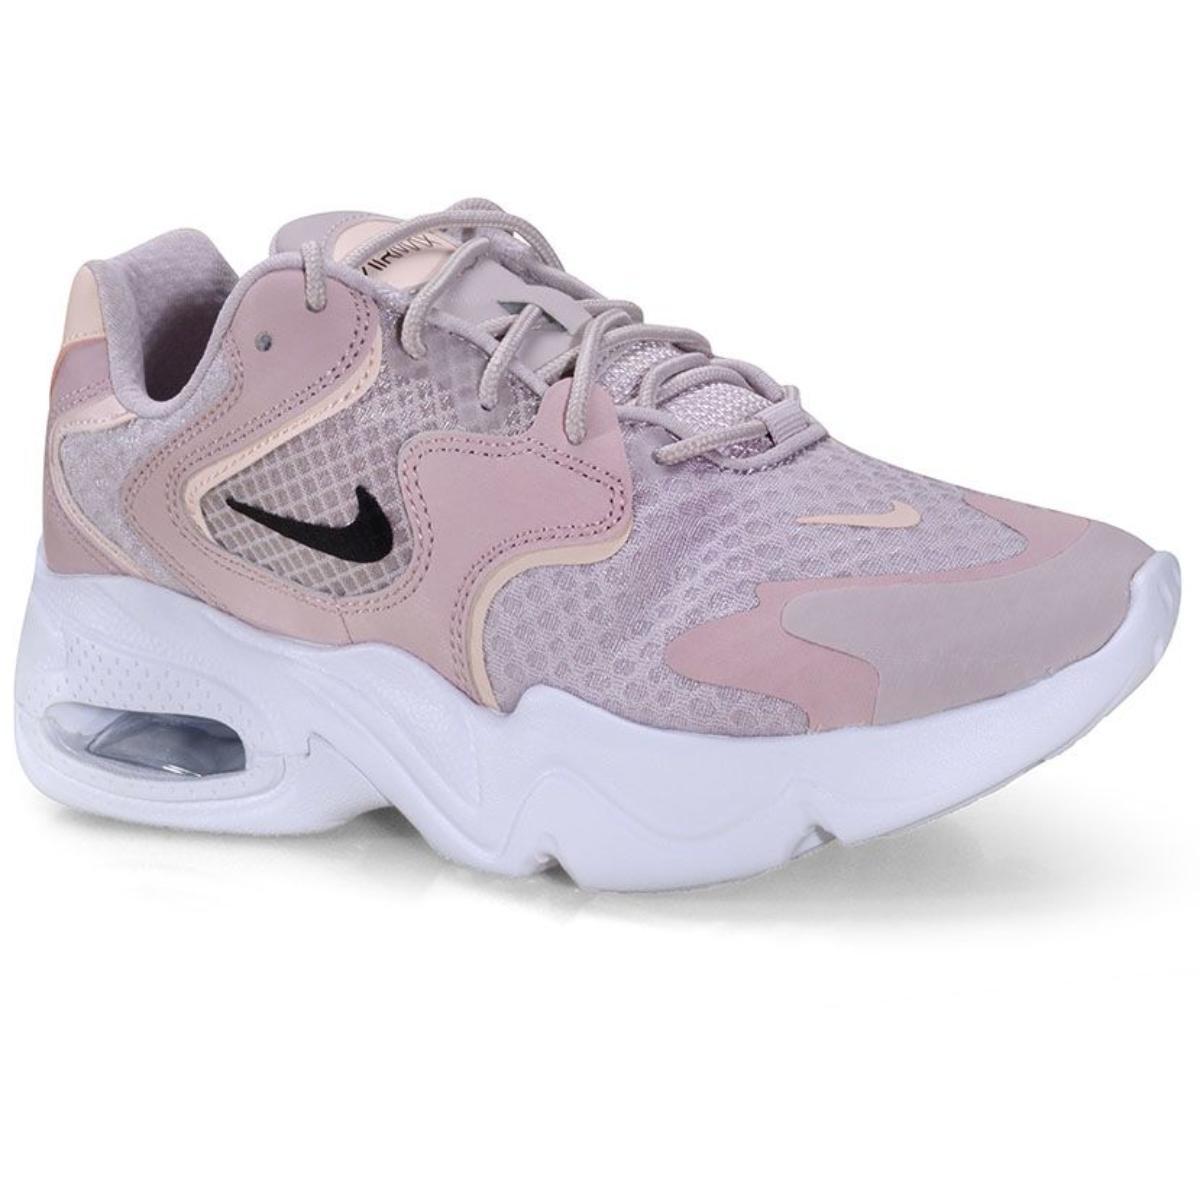 Tênis Feminino Nike Ck2947-600 Air Max 2x Rosa